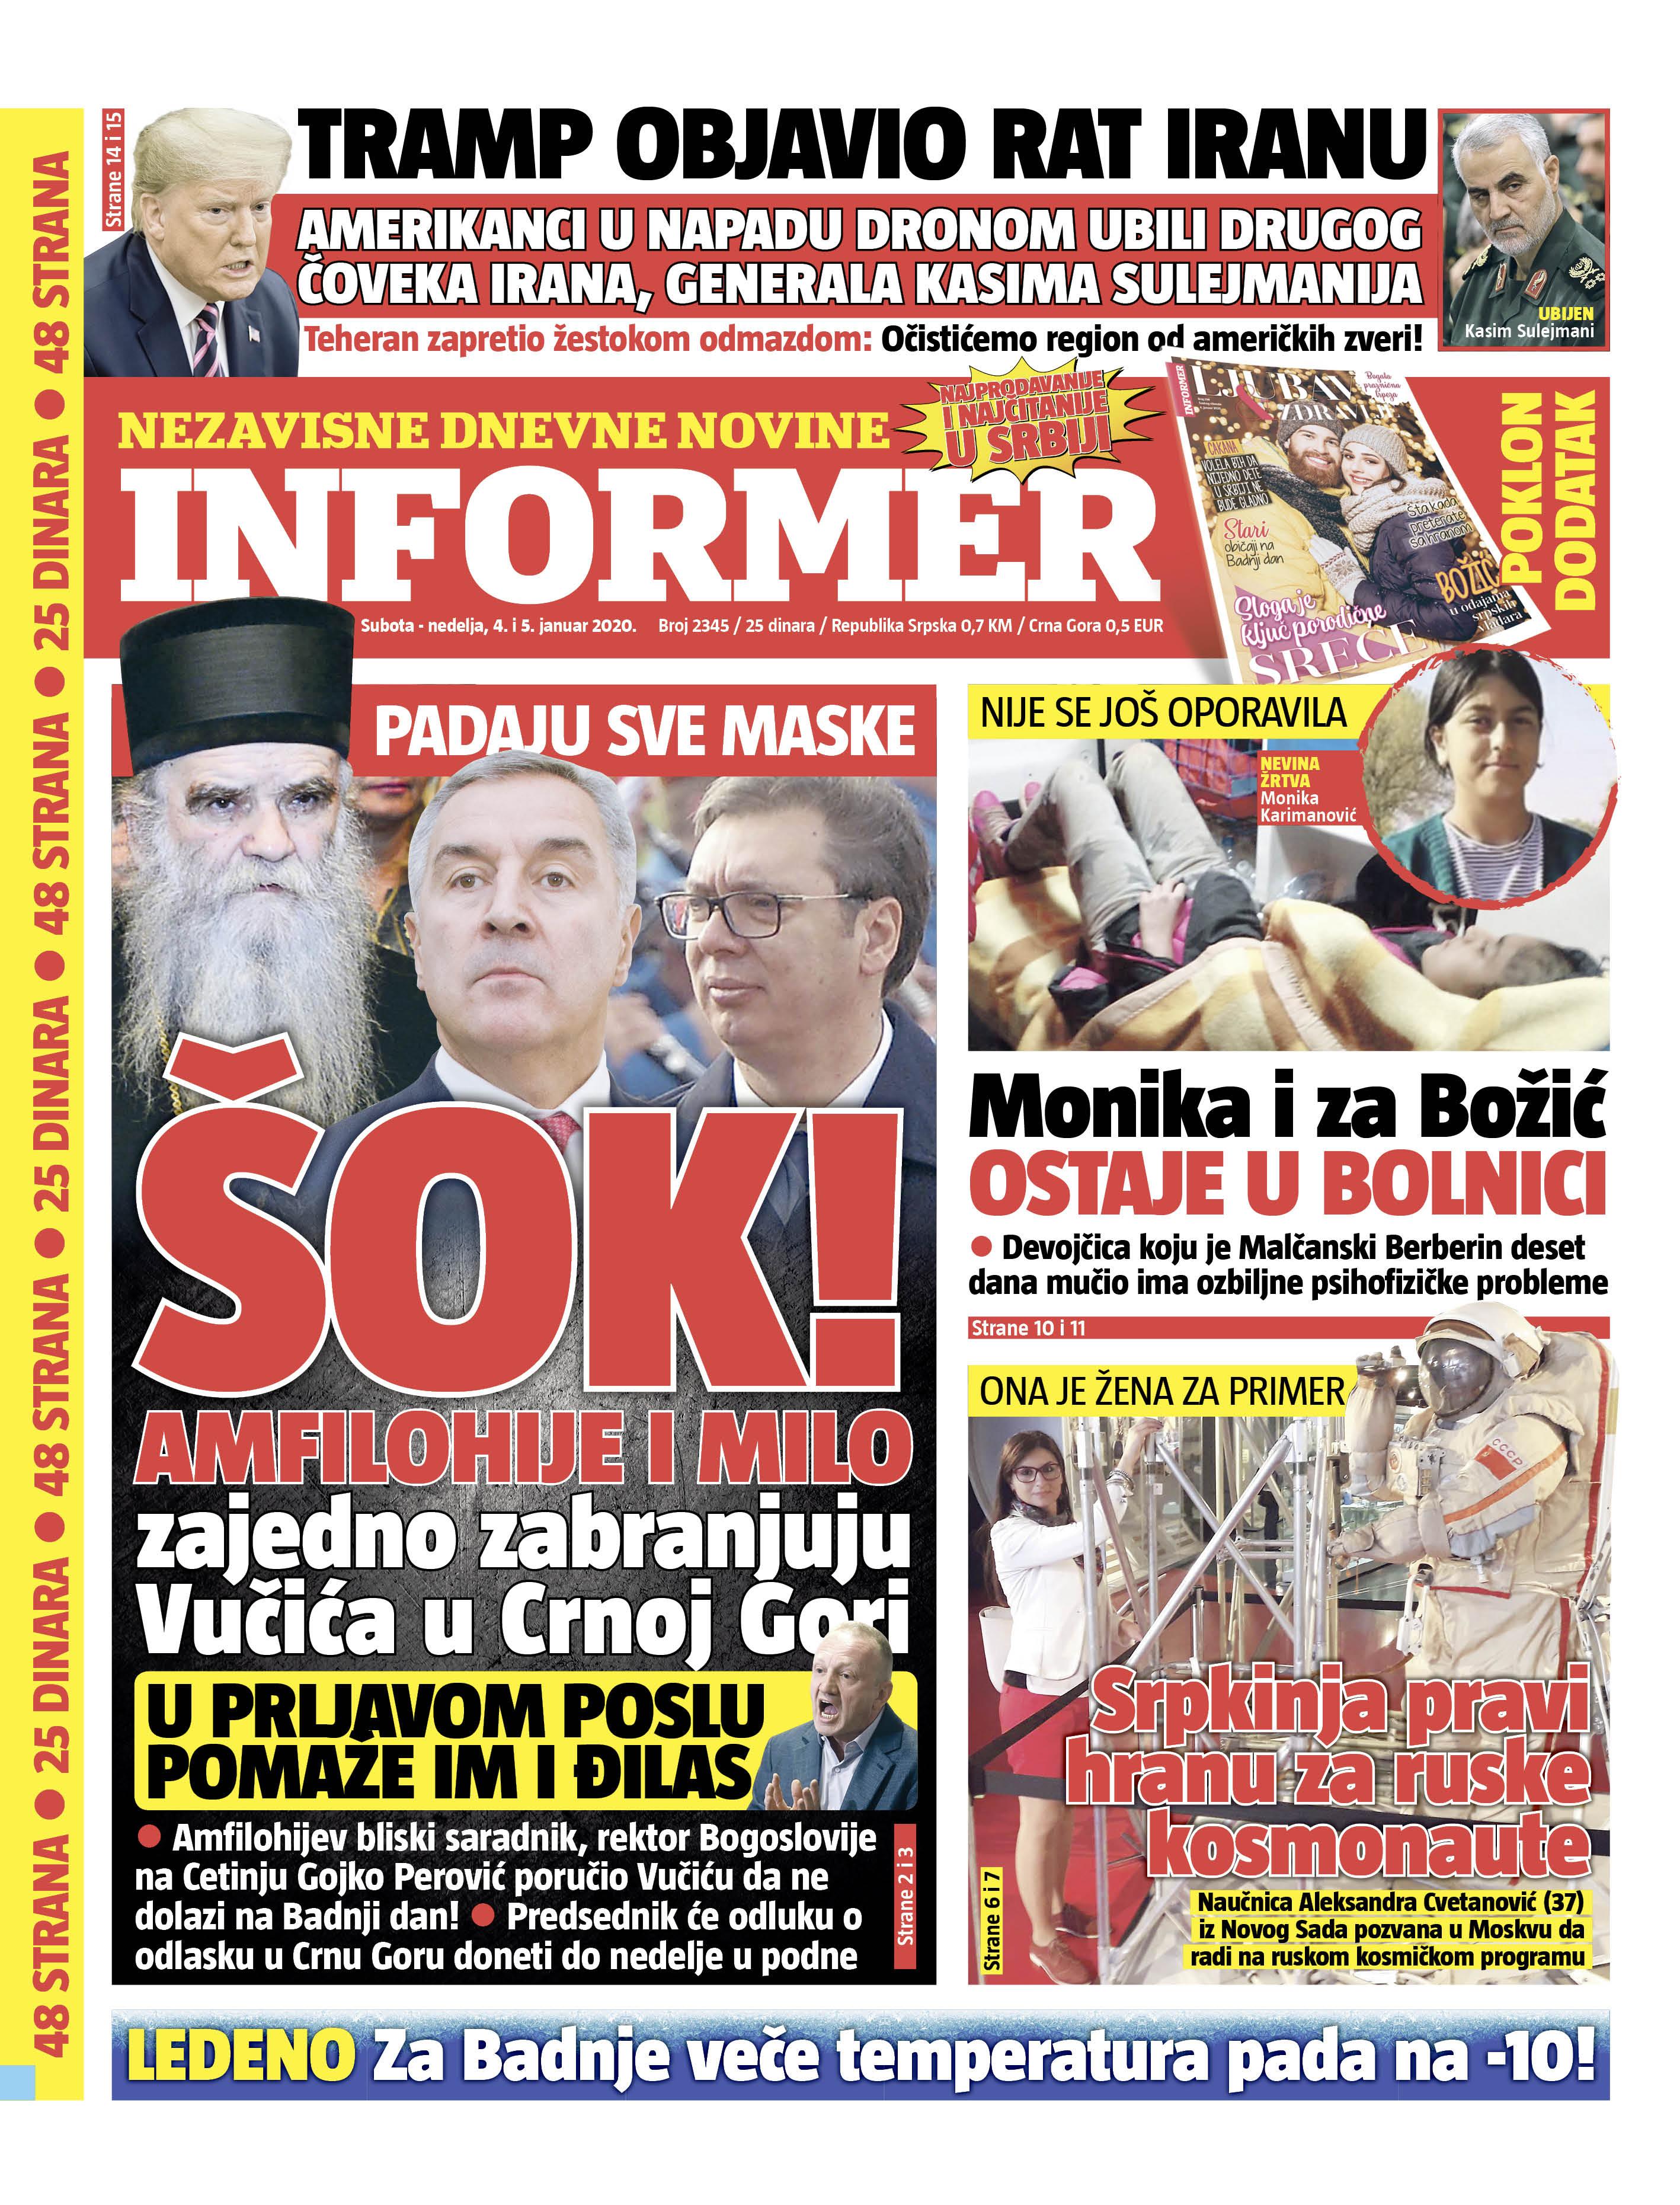 Naslovnica Informera